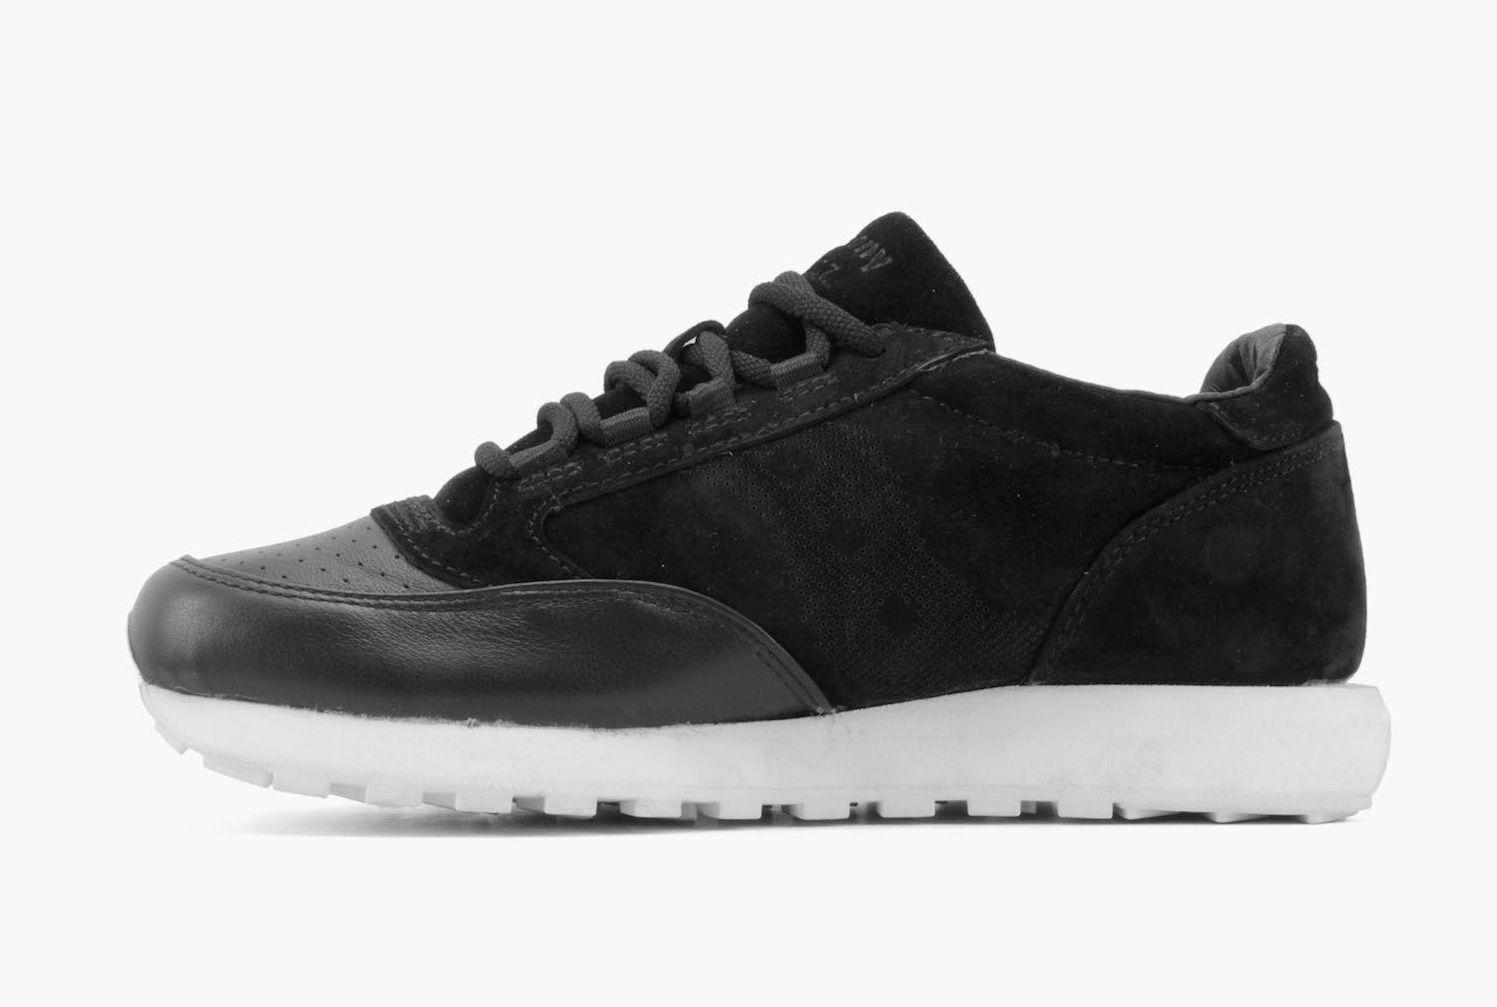 Спортивная обувь SAUCONY S70264-1 Jazz O 35th Anniversary